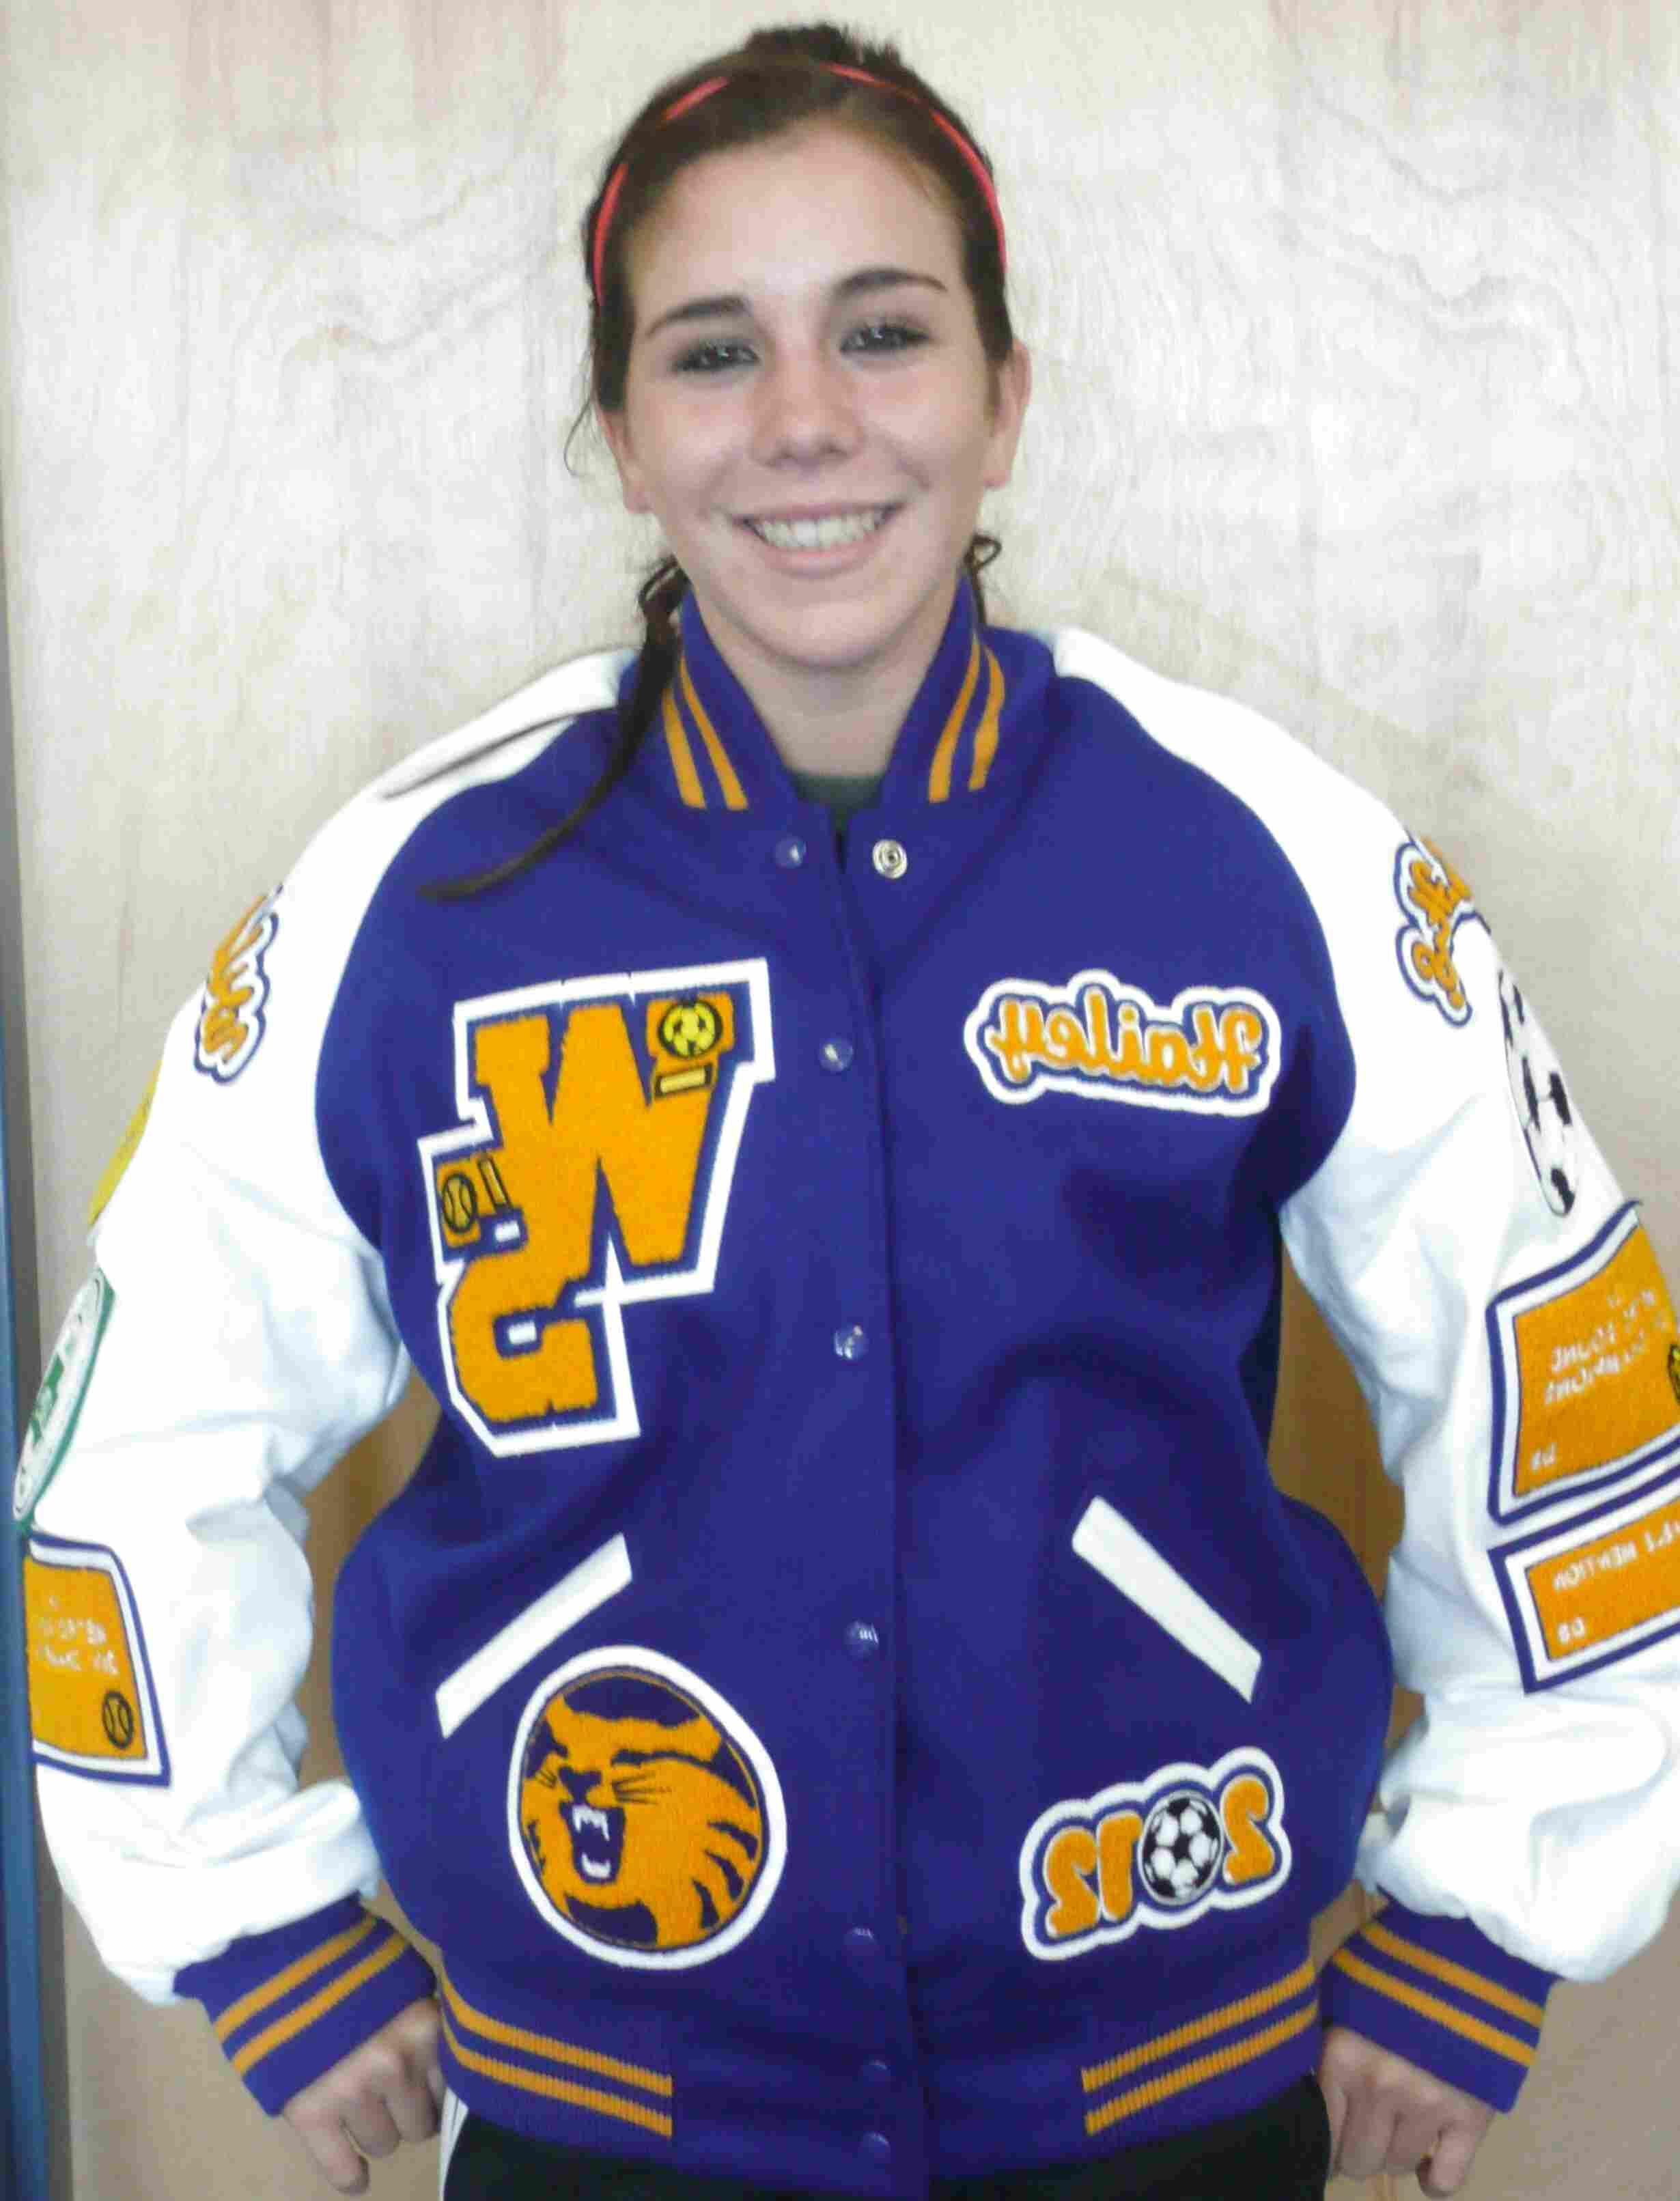 high school varsity jackets for sale